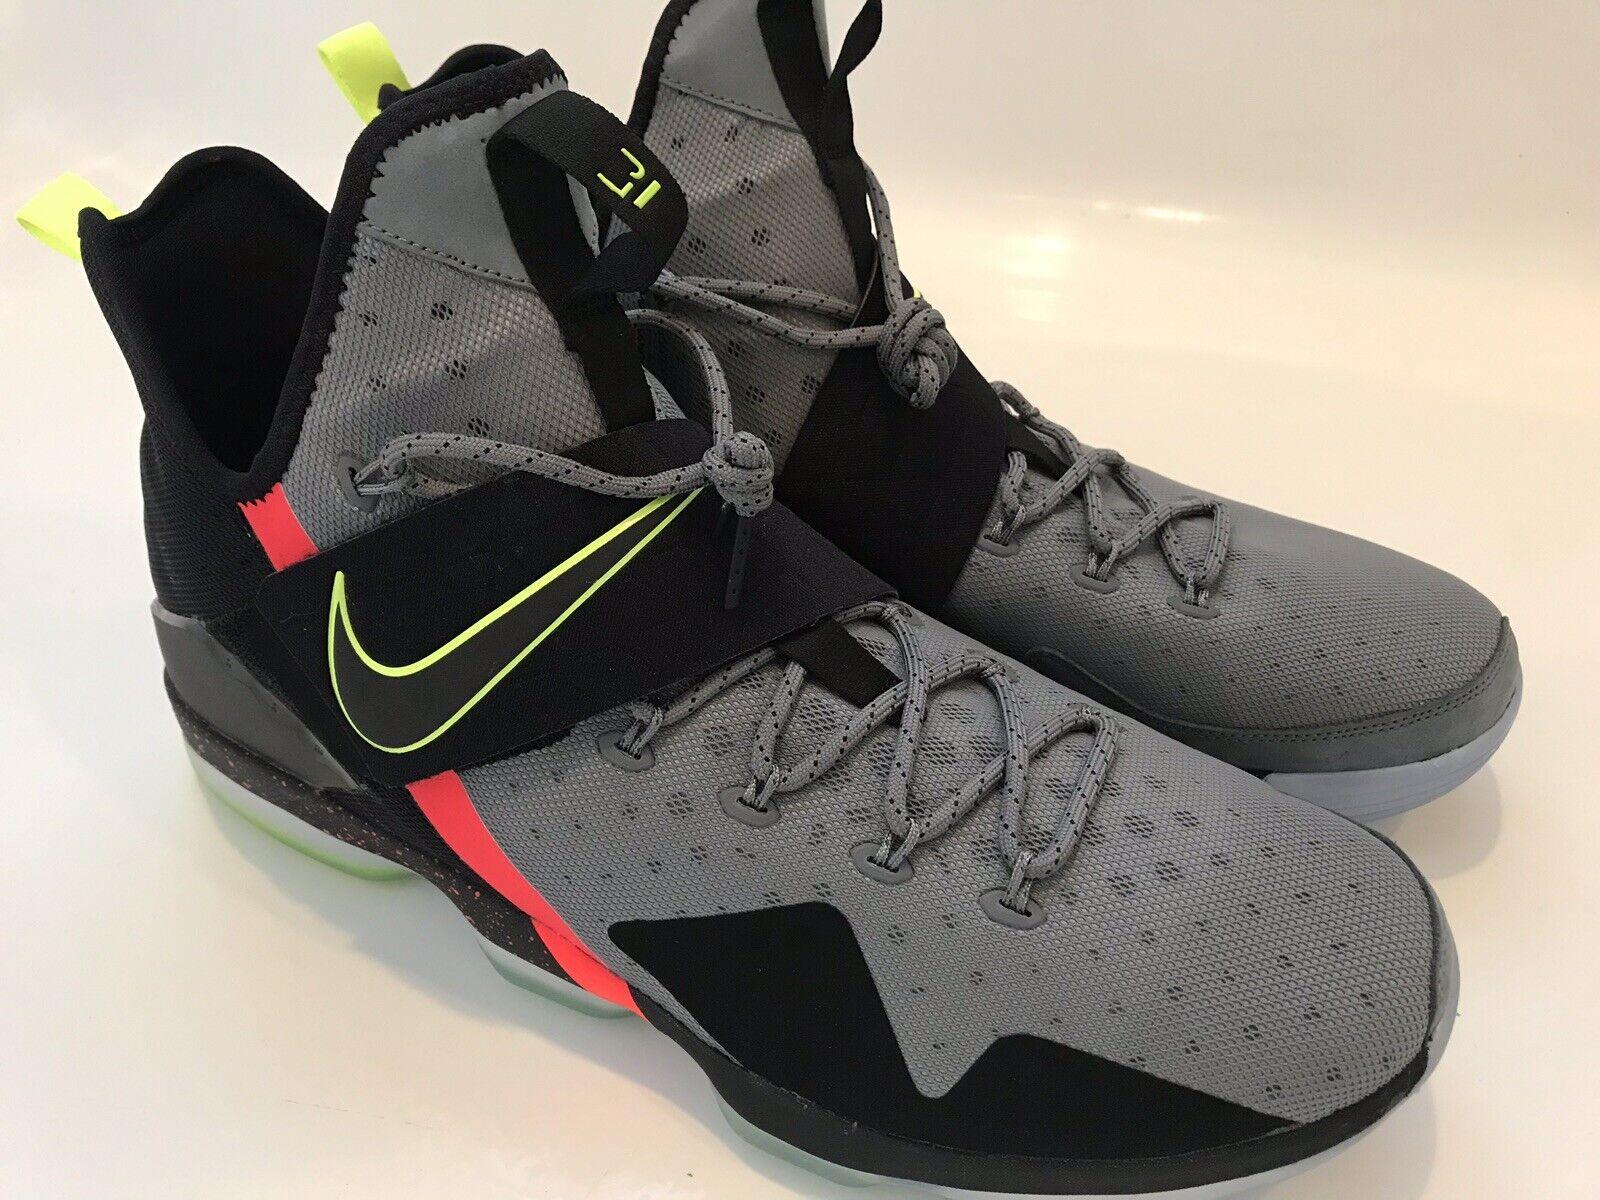 0ce27cd9e8a ... Super Rare Nike LeBron 14 Out Of Nowhere Xmas